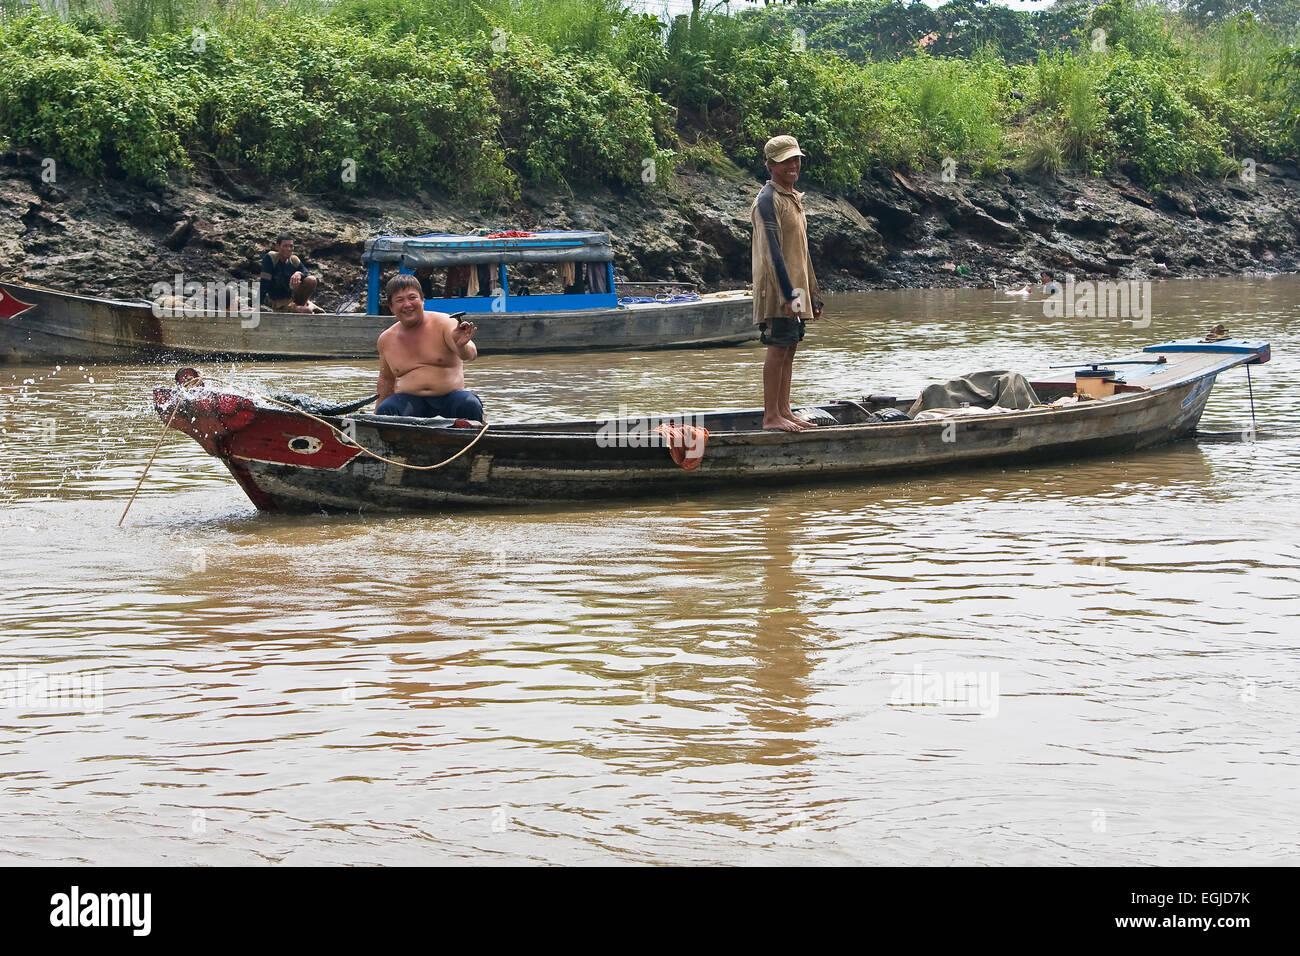 Vietnamese men on a boat on the Saigon River, Saigon, Ho Chi Minh City, Vietnam, Asia - Stock Image